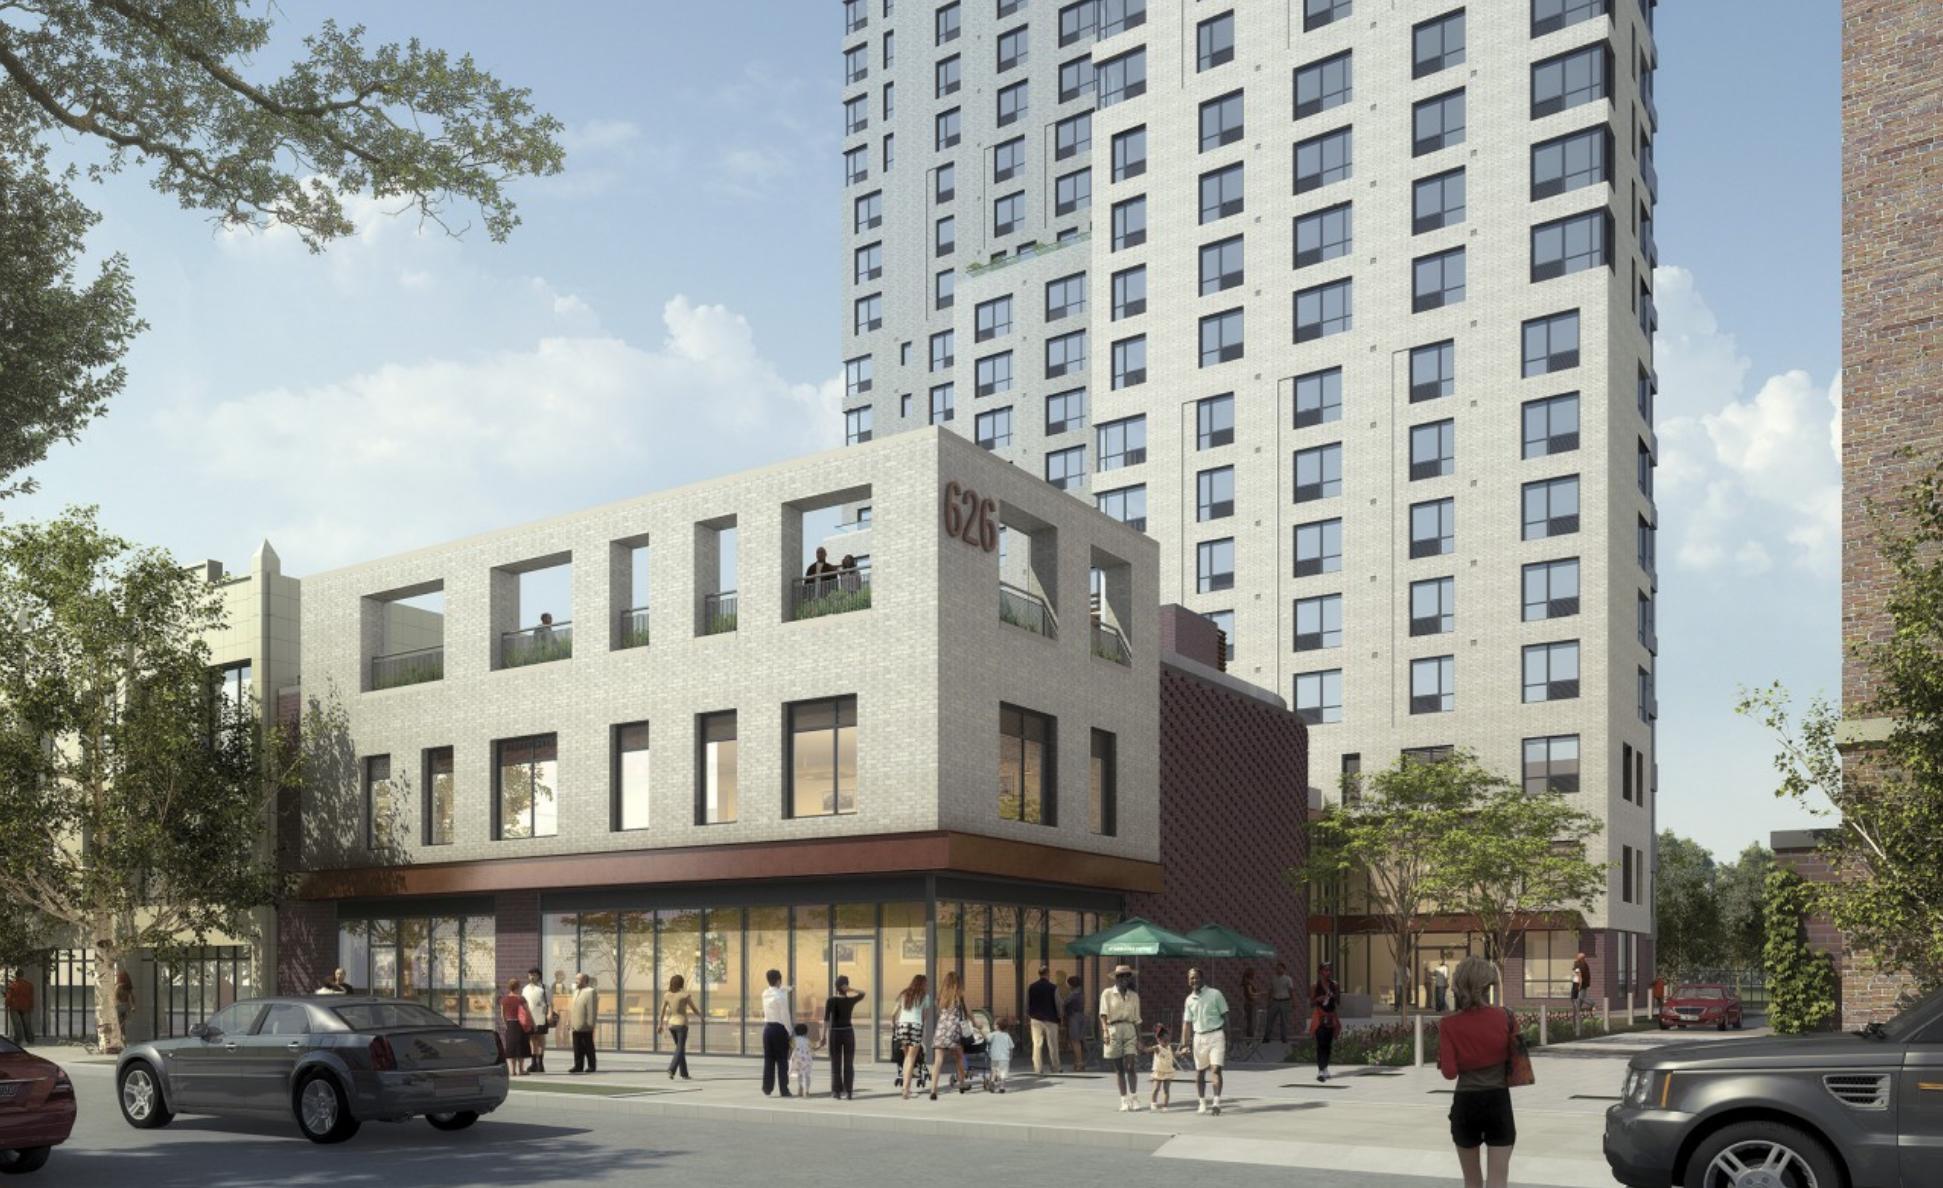 Rendering of 626 Flatbush Avenue. Credit: Marvel Architects